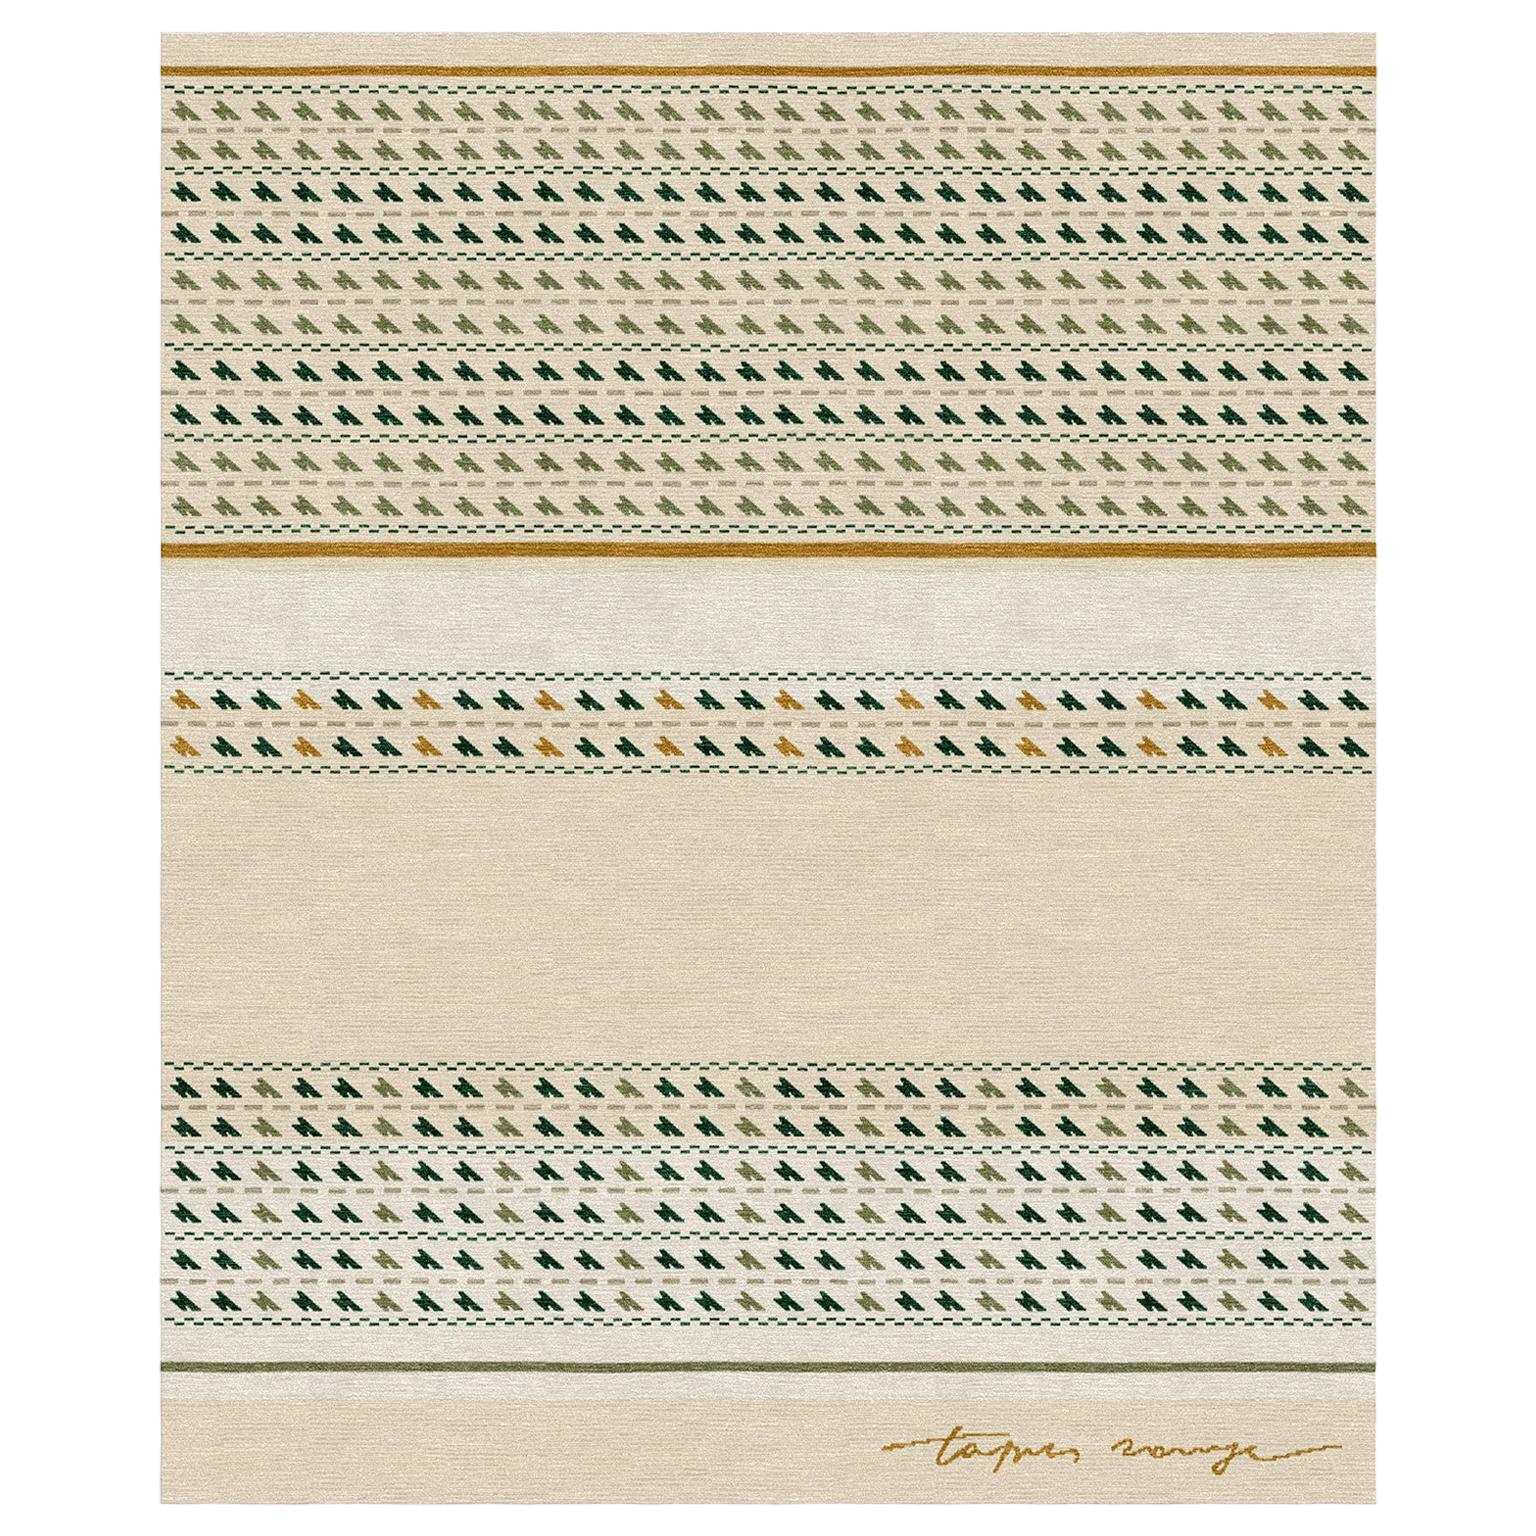 Sonico Tortora - Geometric Contemporary Hand Knotted Wool Bamboo Silk Rug